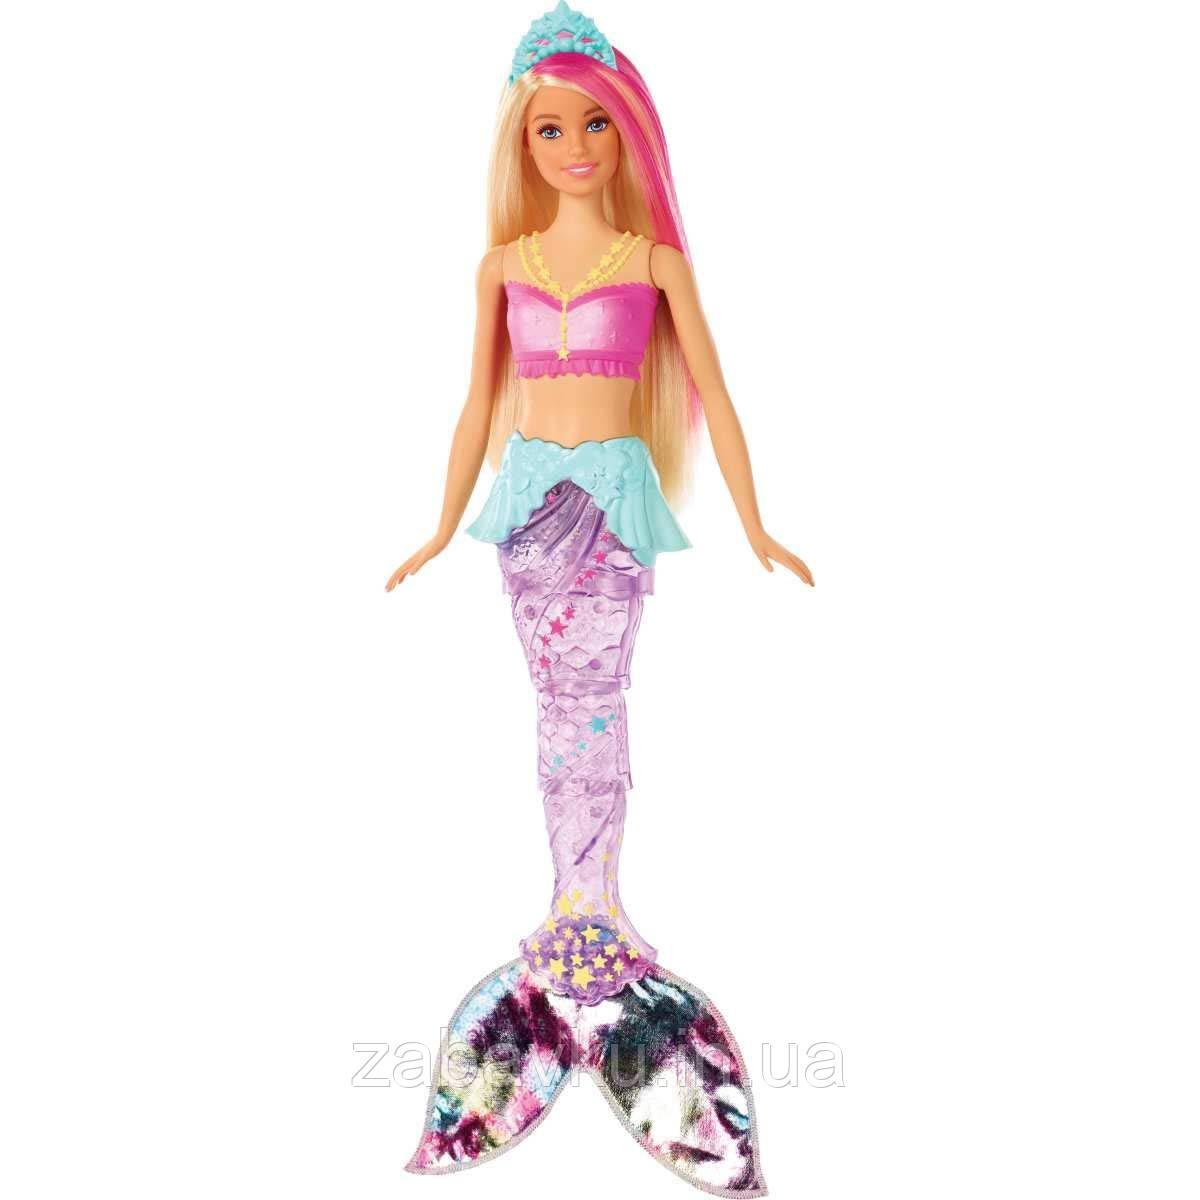 Барбі райдужна русалочка, Barbie Dreamtopia Sparkle Lights Mermaid Blonde